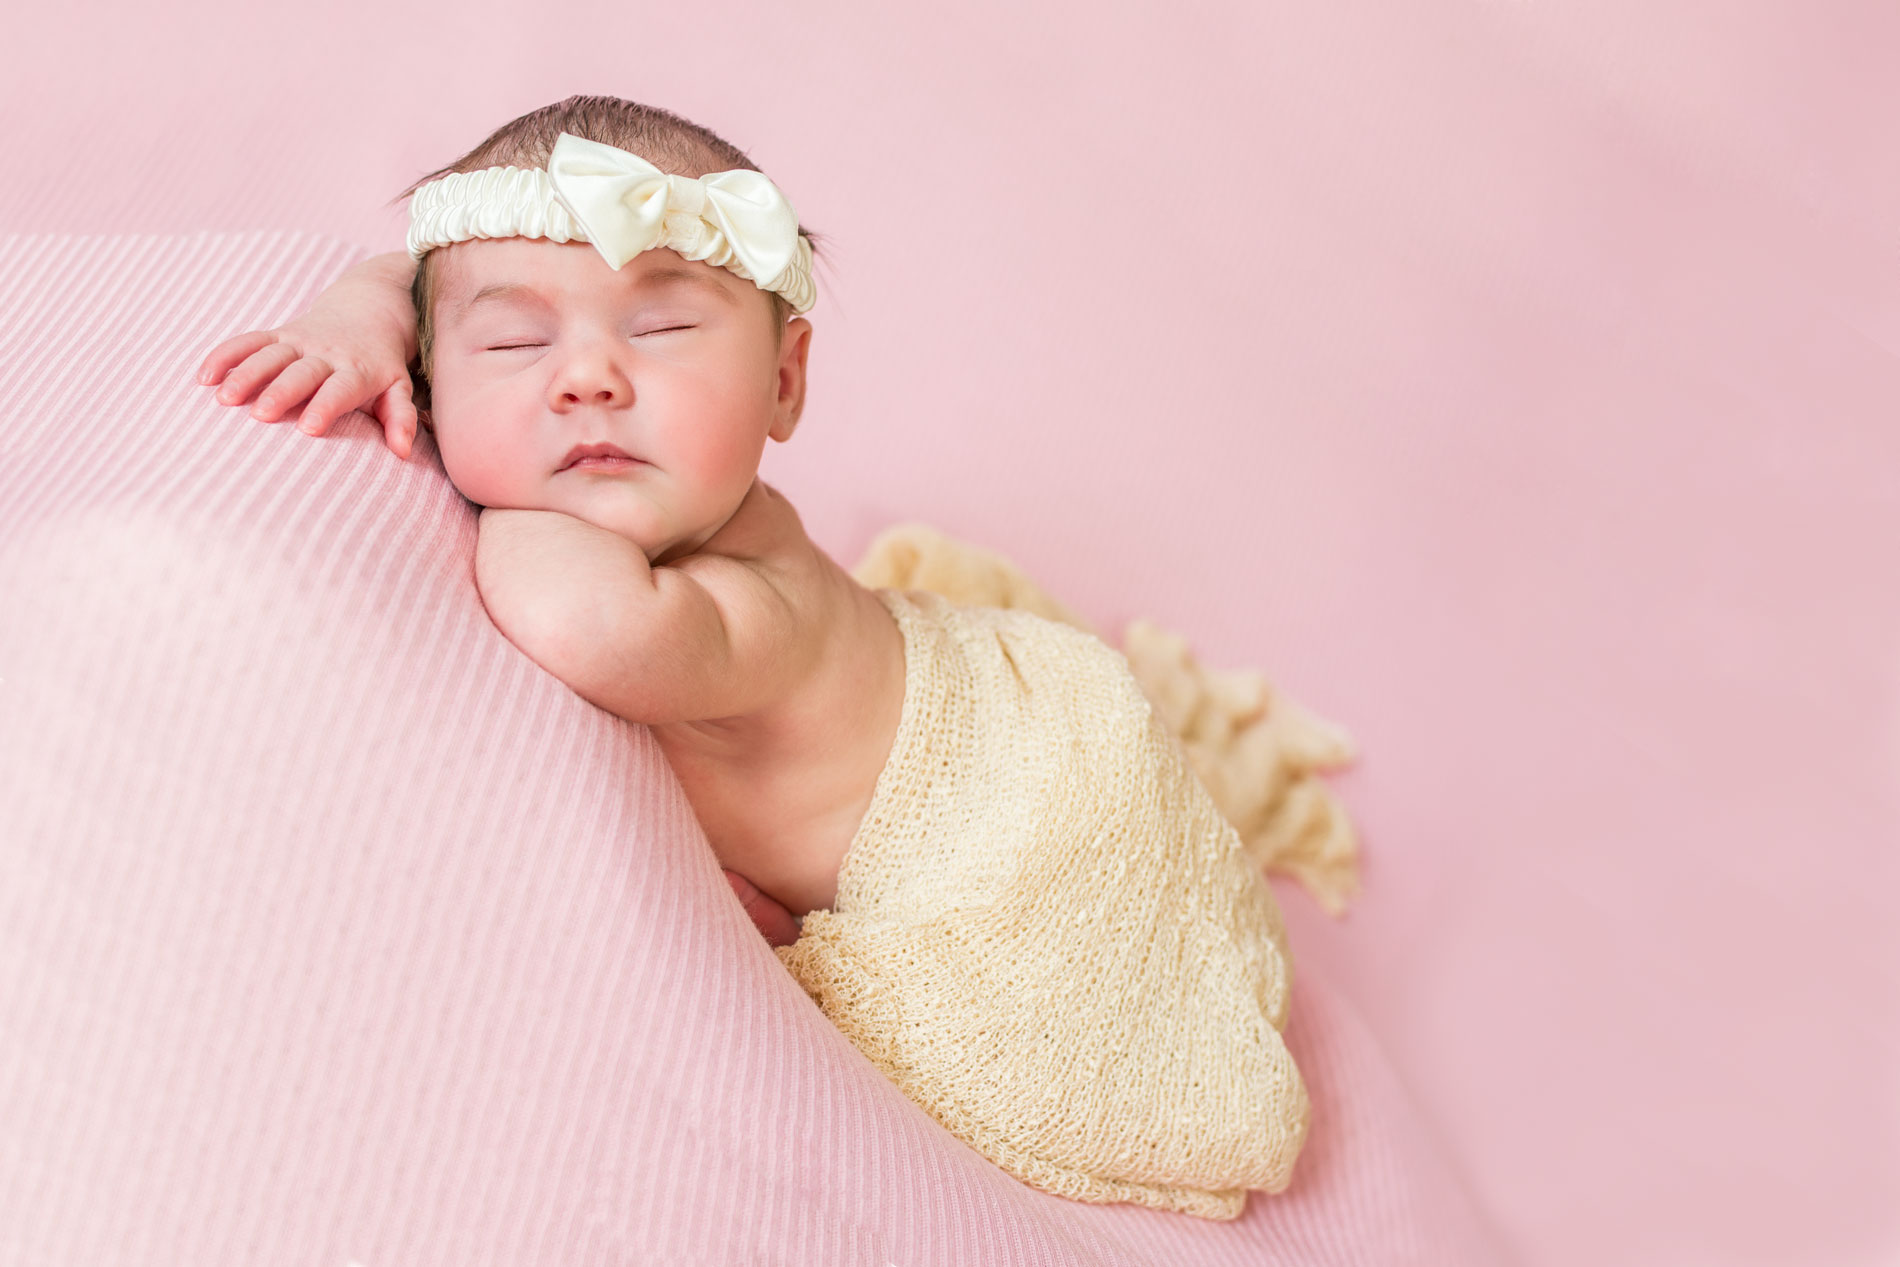 Cute newborn photo of baby girl from Thunder Bay